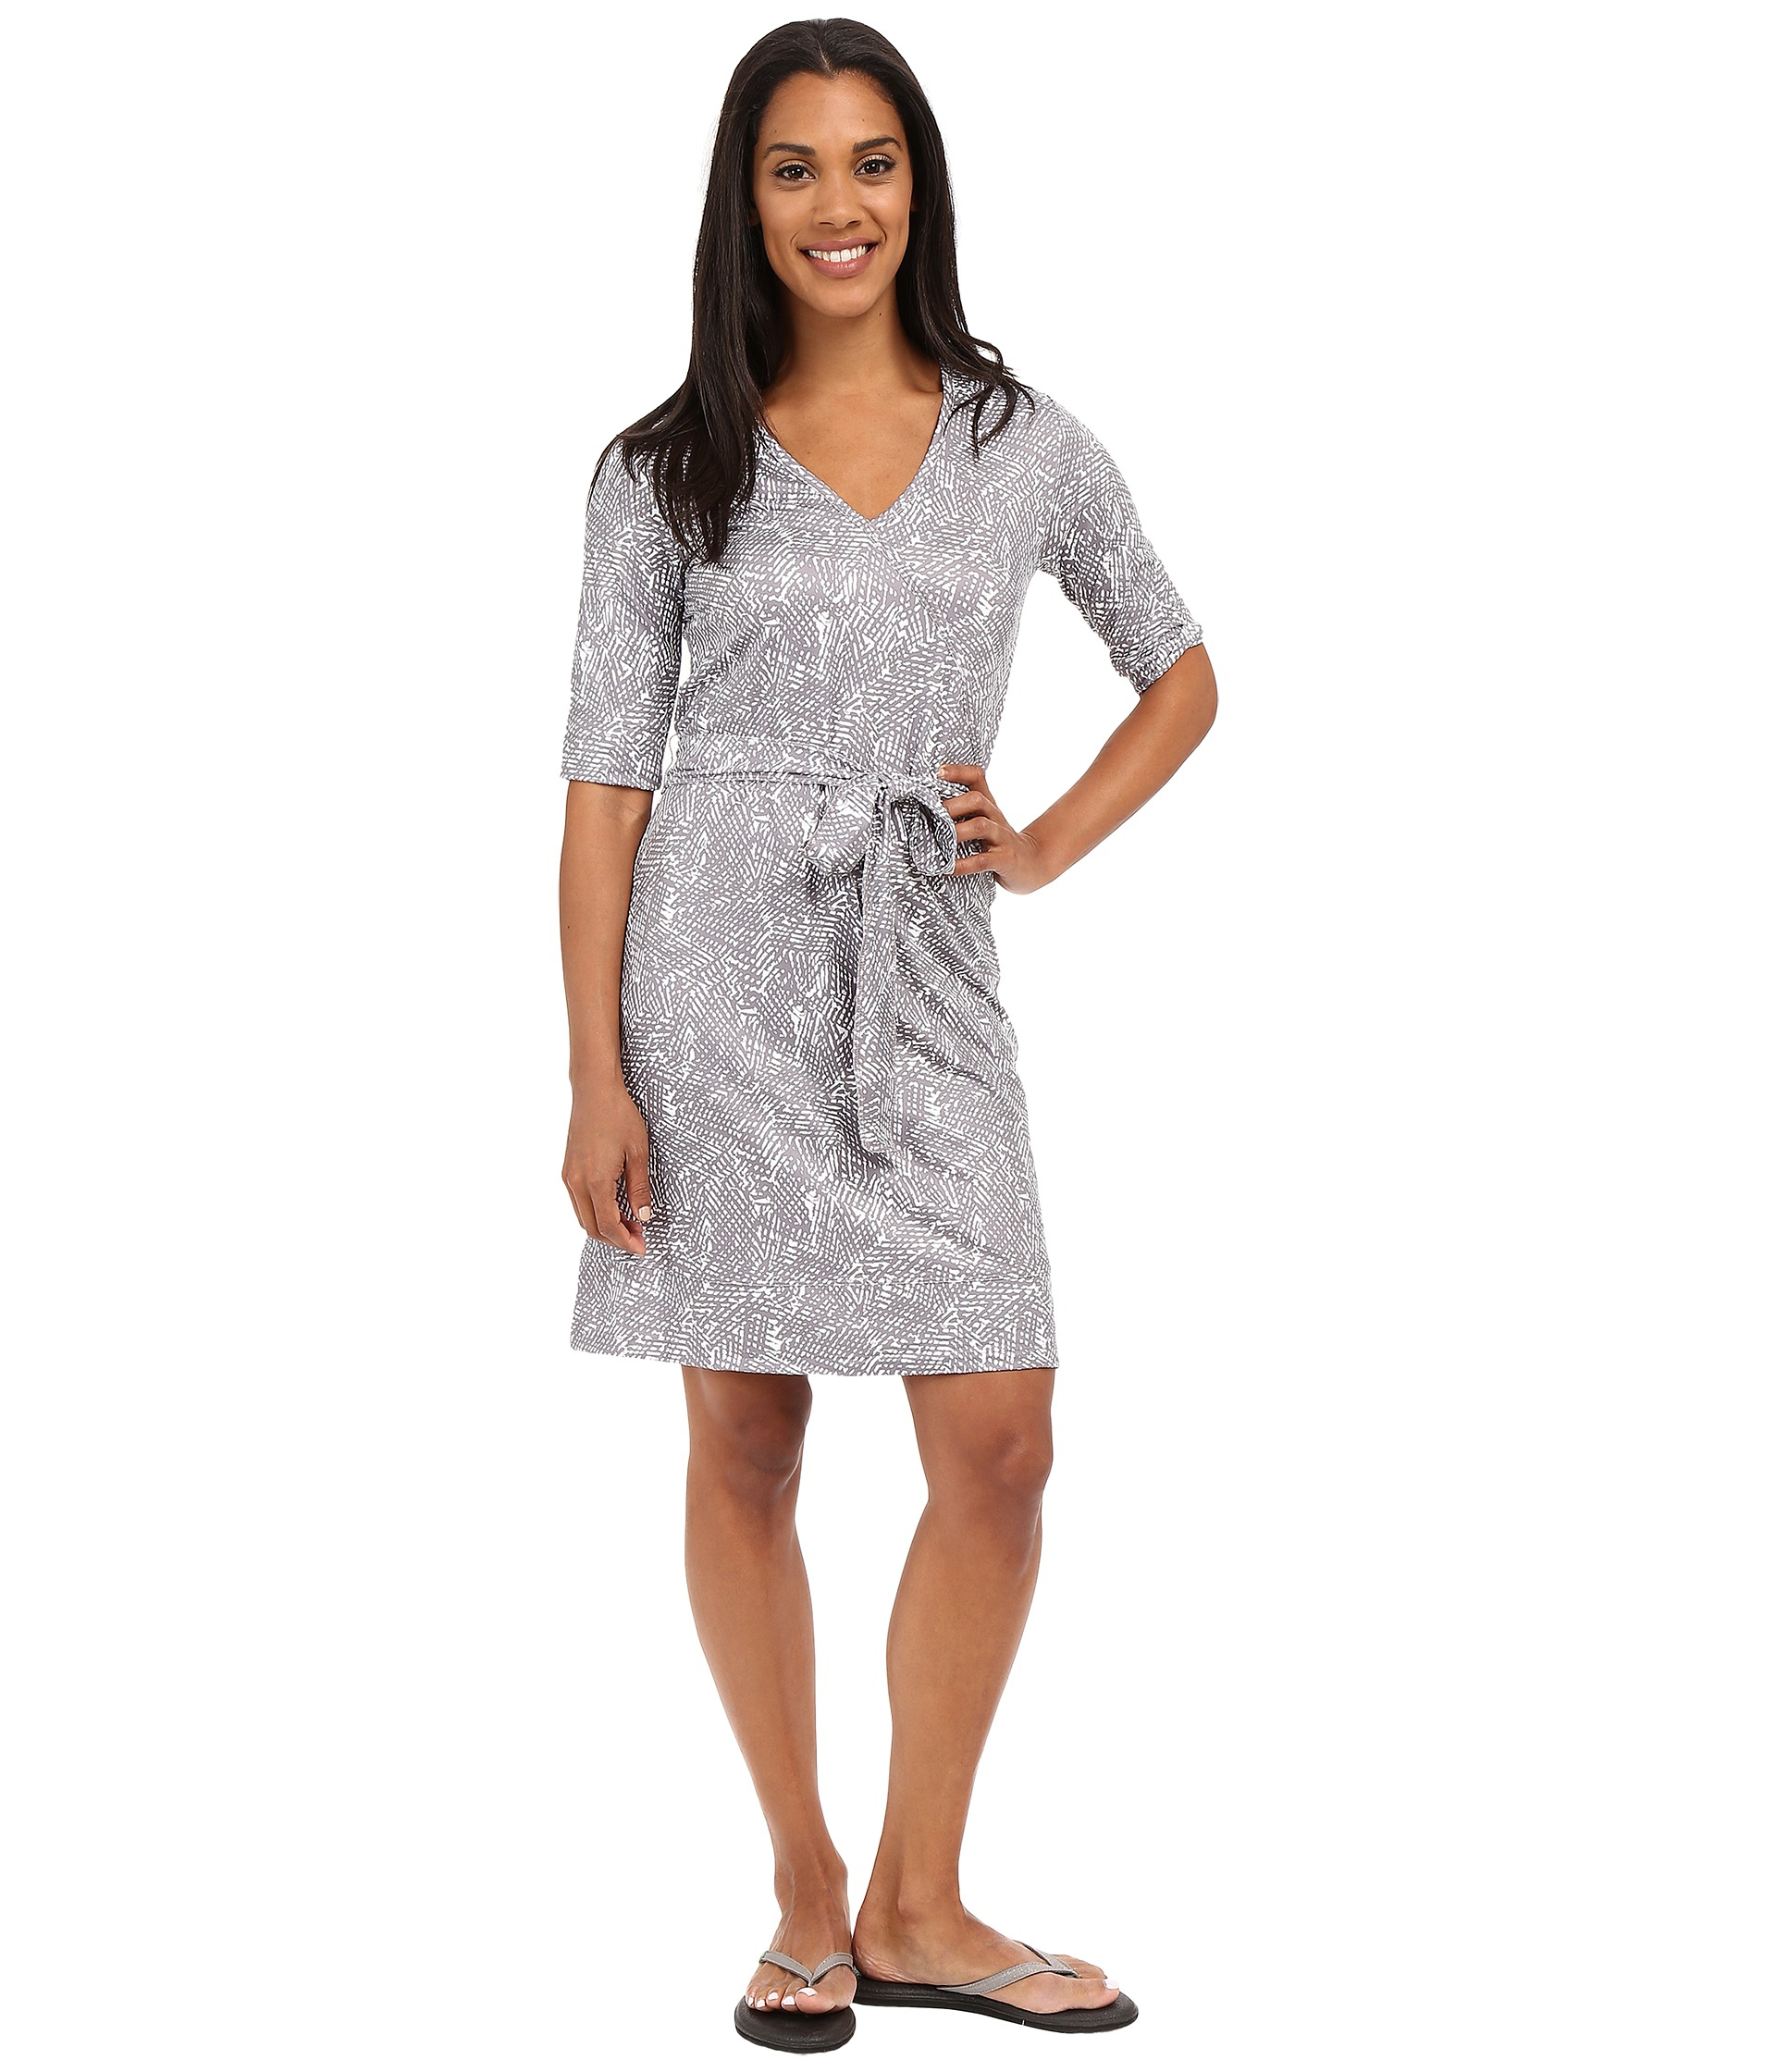 Lolë Blair Dress in Gray